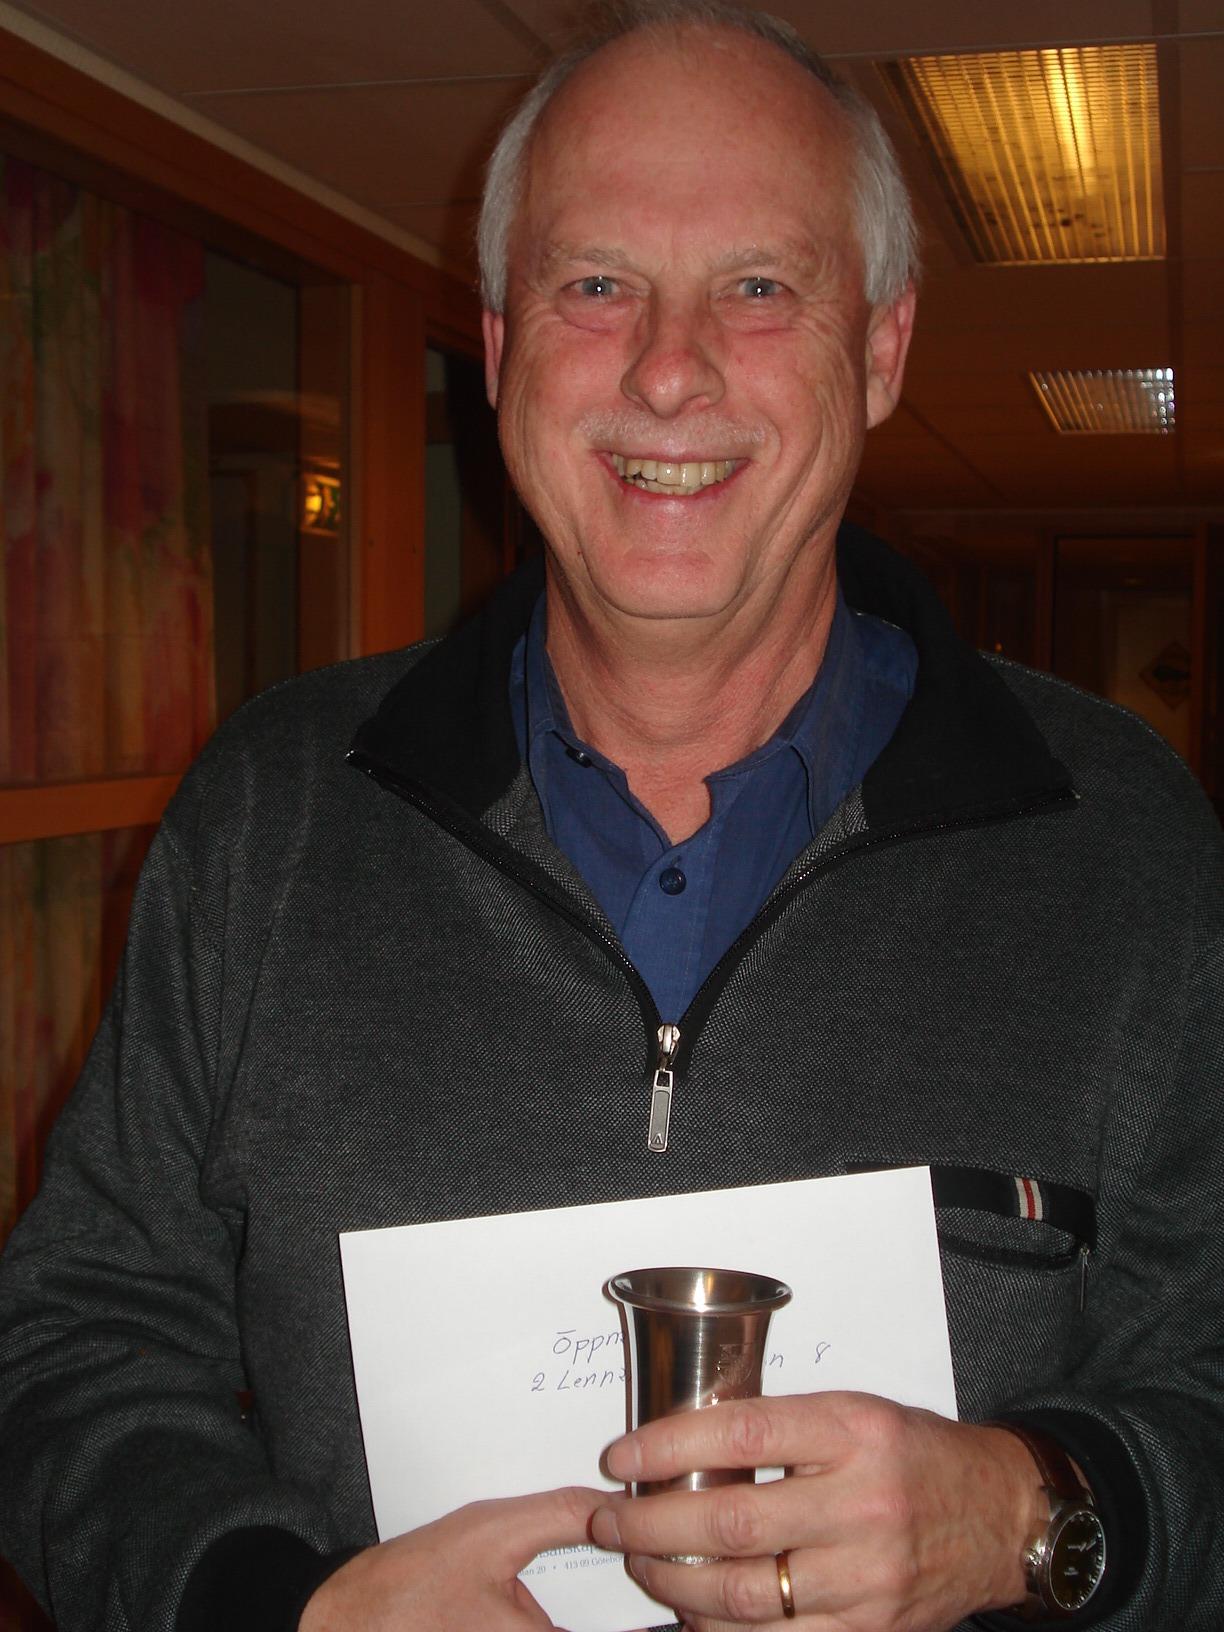 Tvåa i Öppna gruppen: Lennart Hansson.